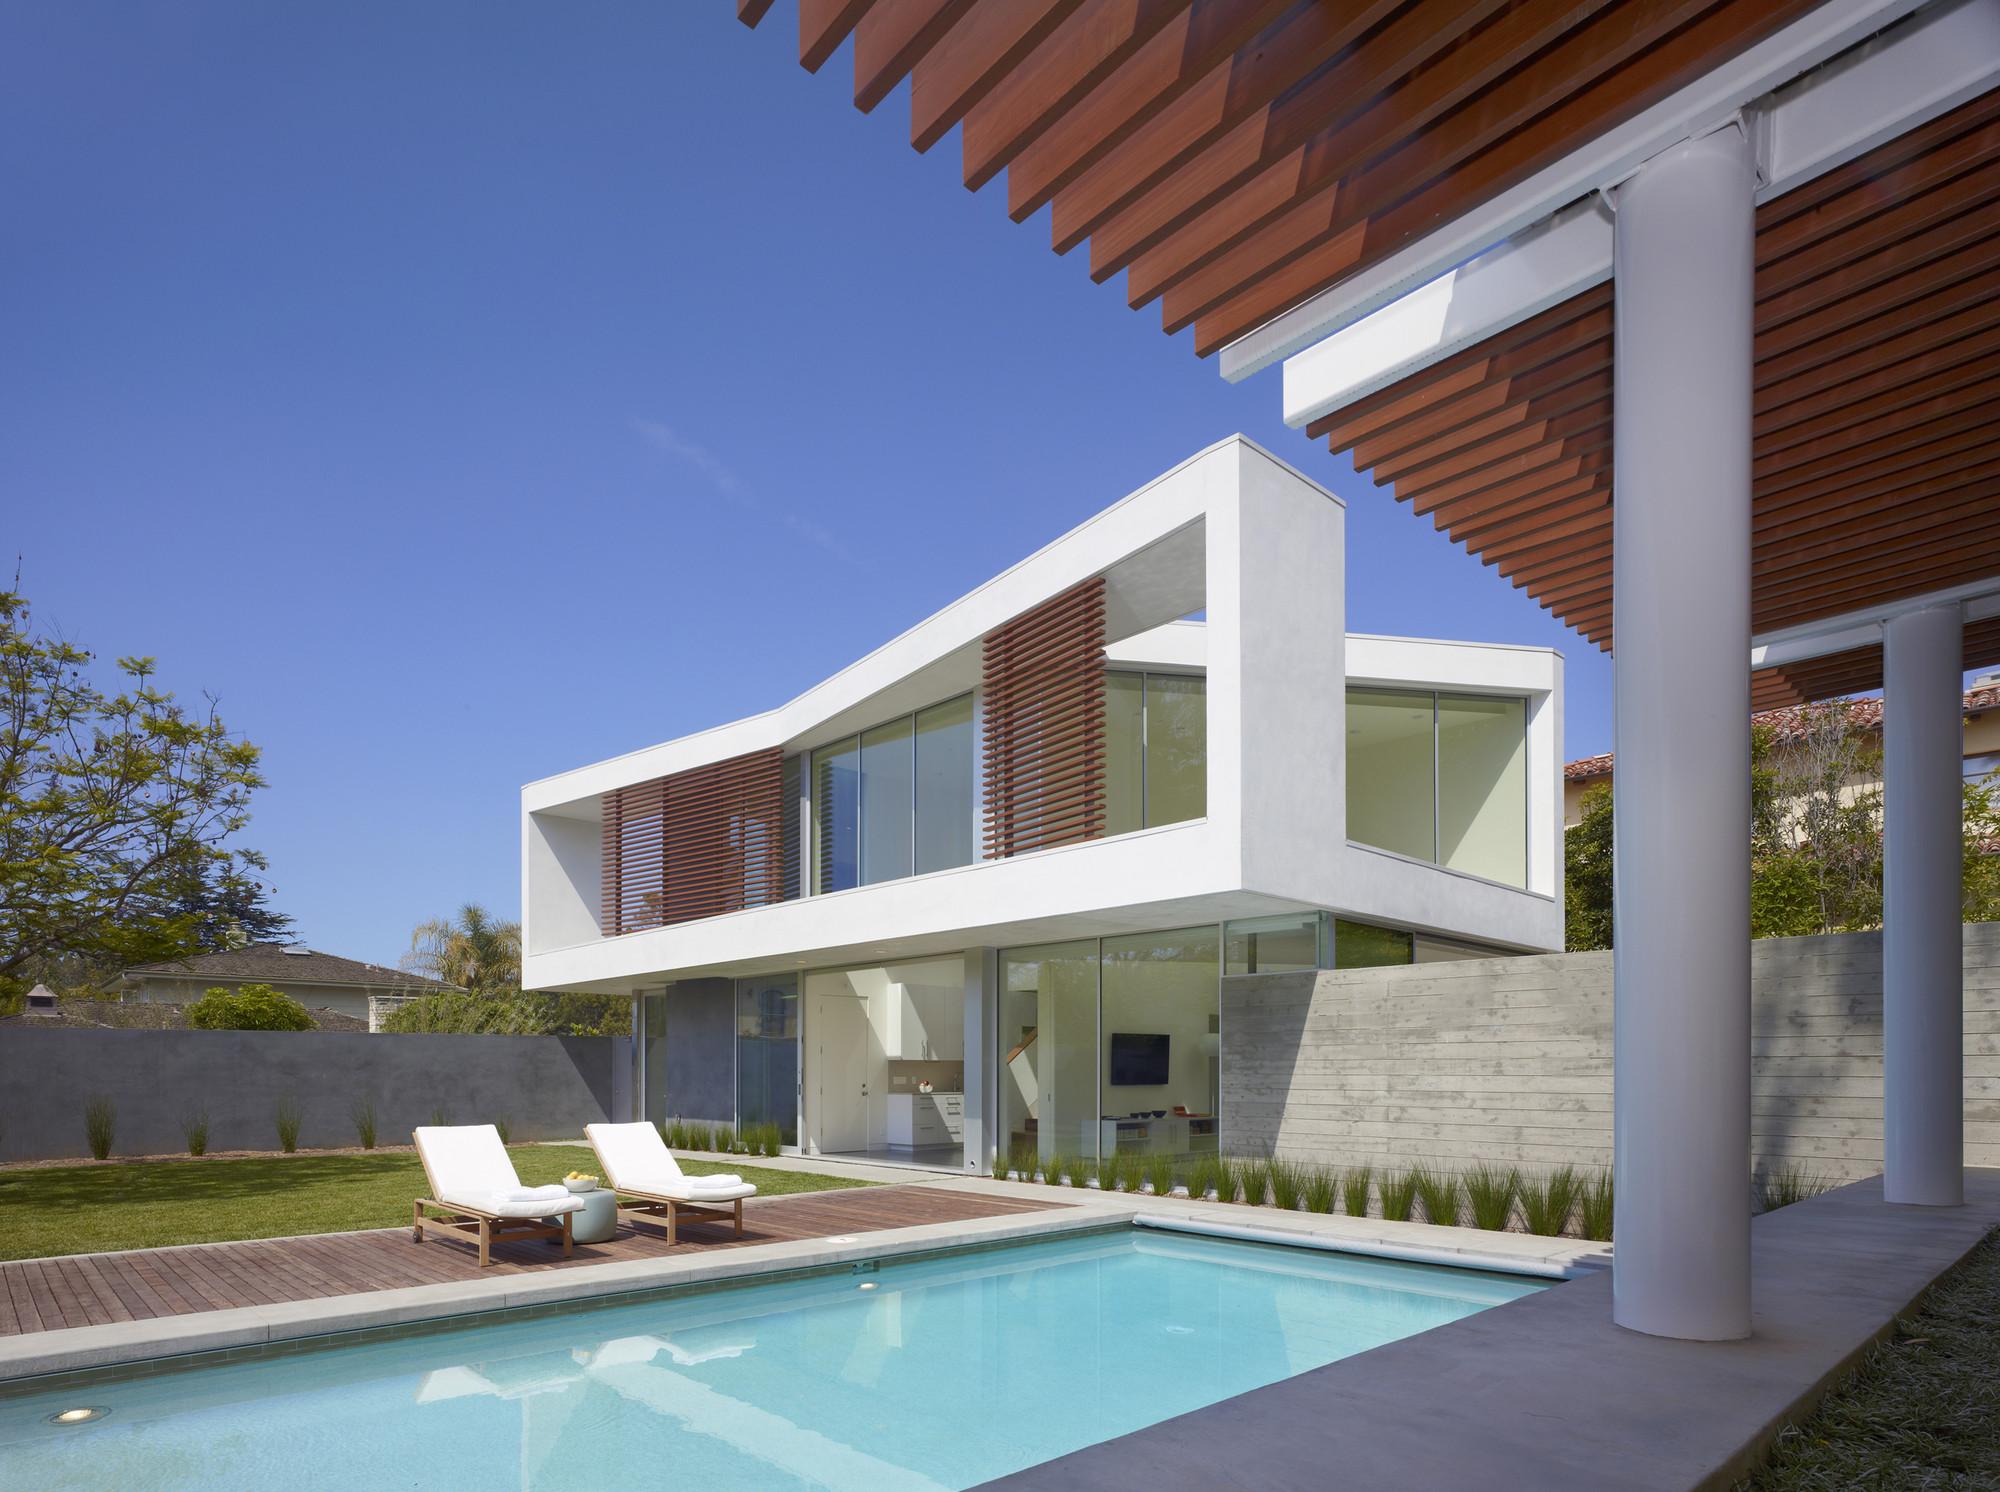 Retiro ehrlich john friedman alice kimm architects - Limposante residence contemporaine de ehrlich architects ...